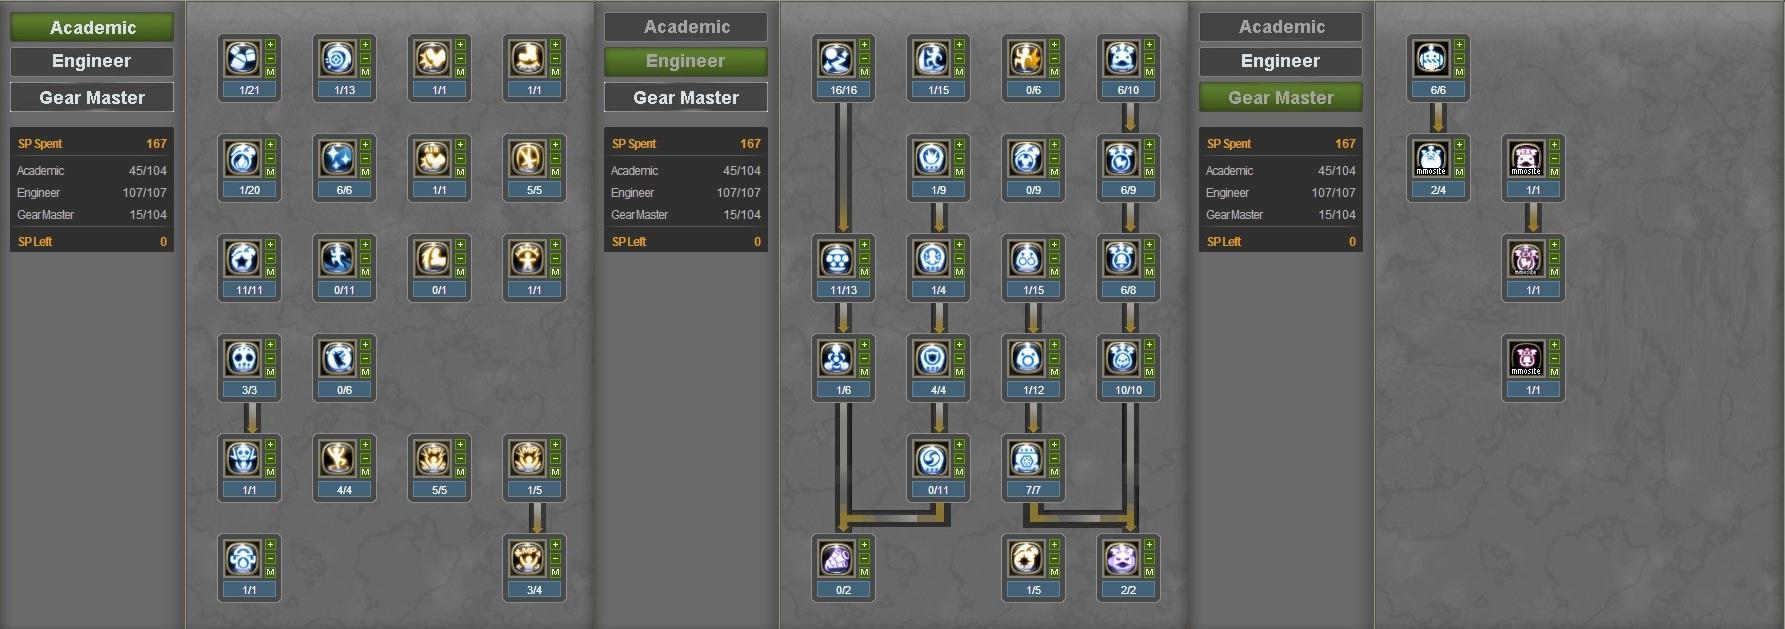 Dragon Nest CN Gear Master Max FD Build | GuideScroll